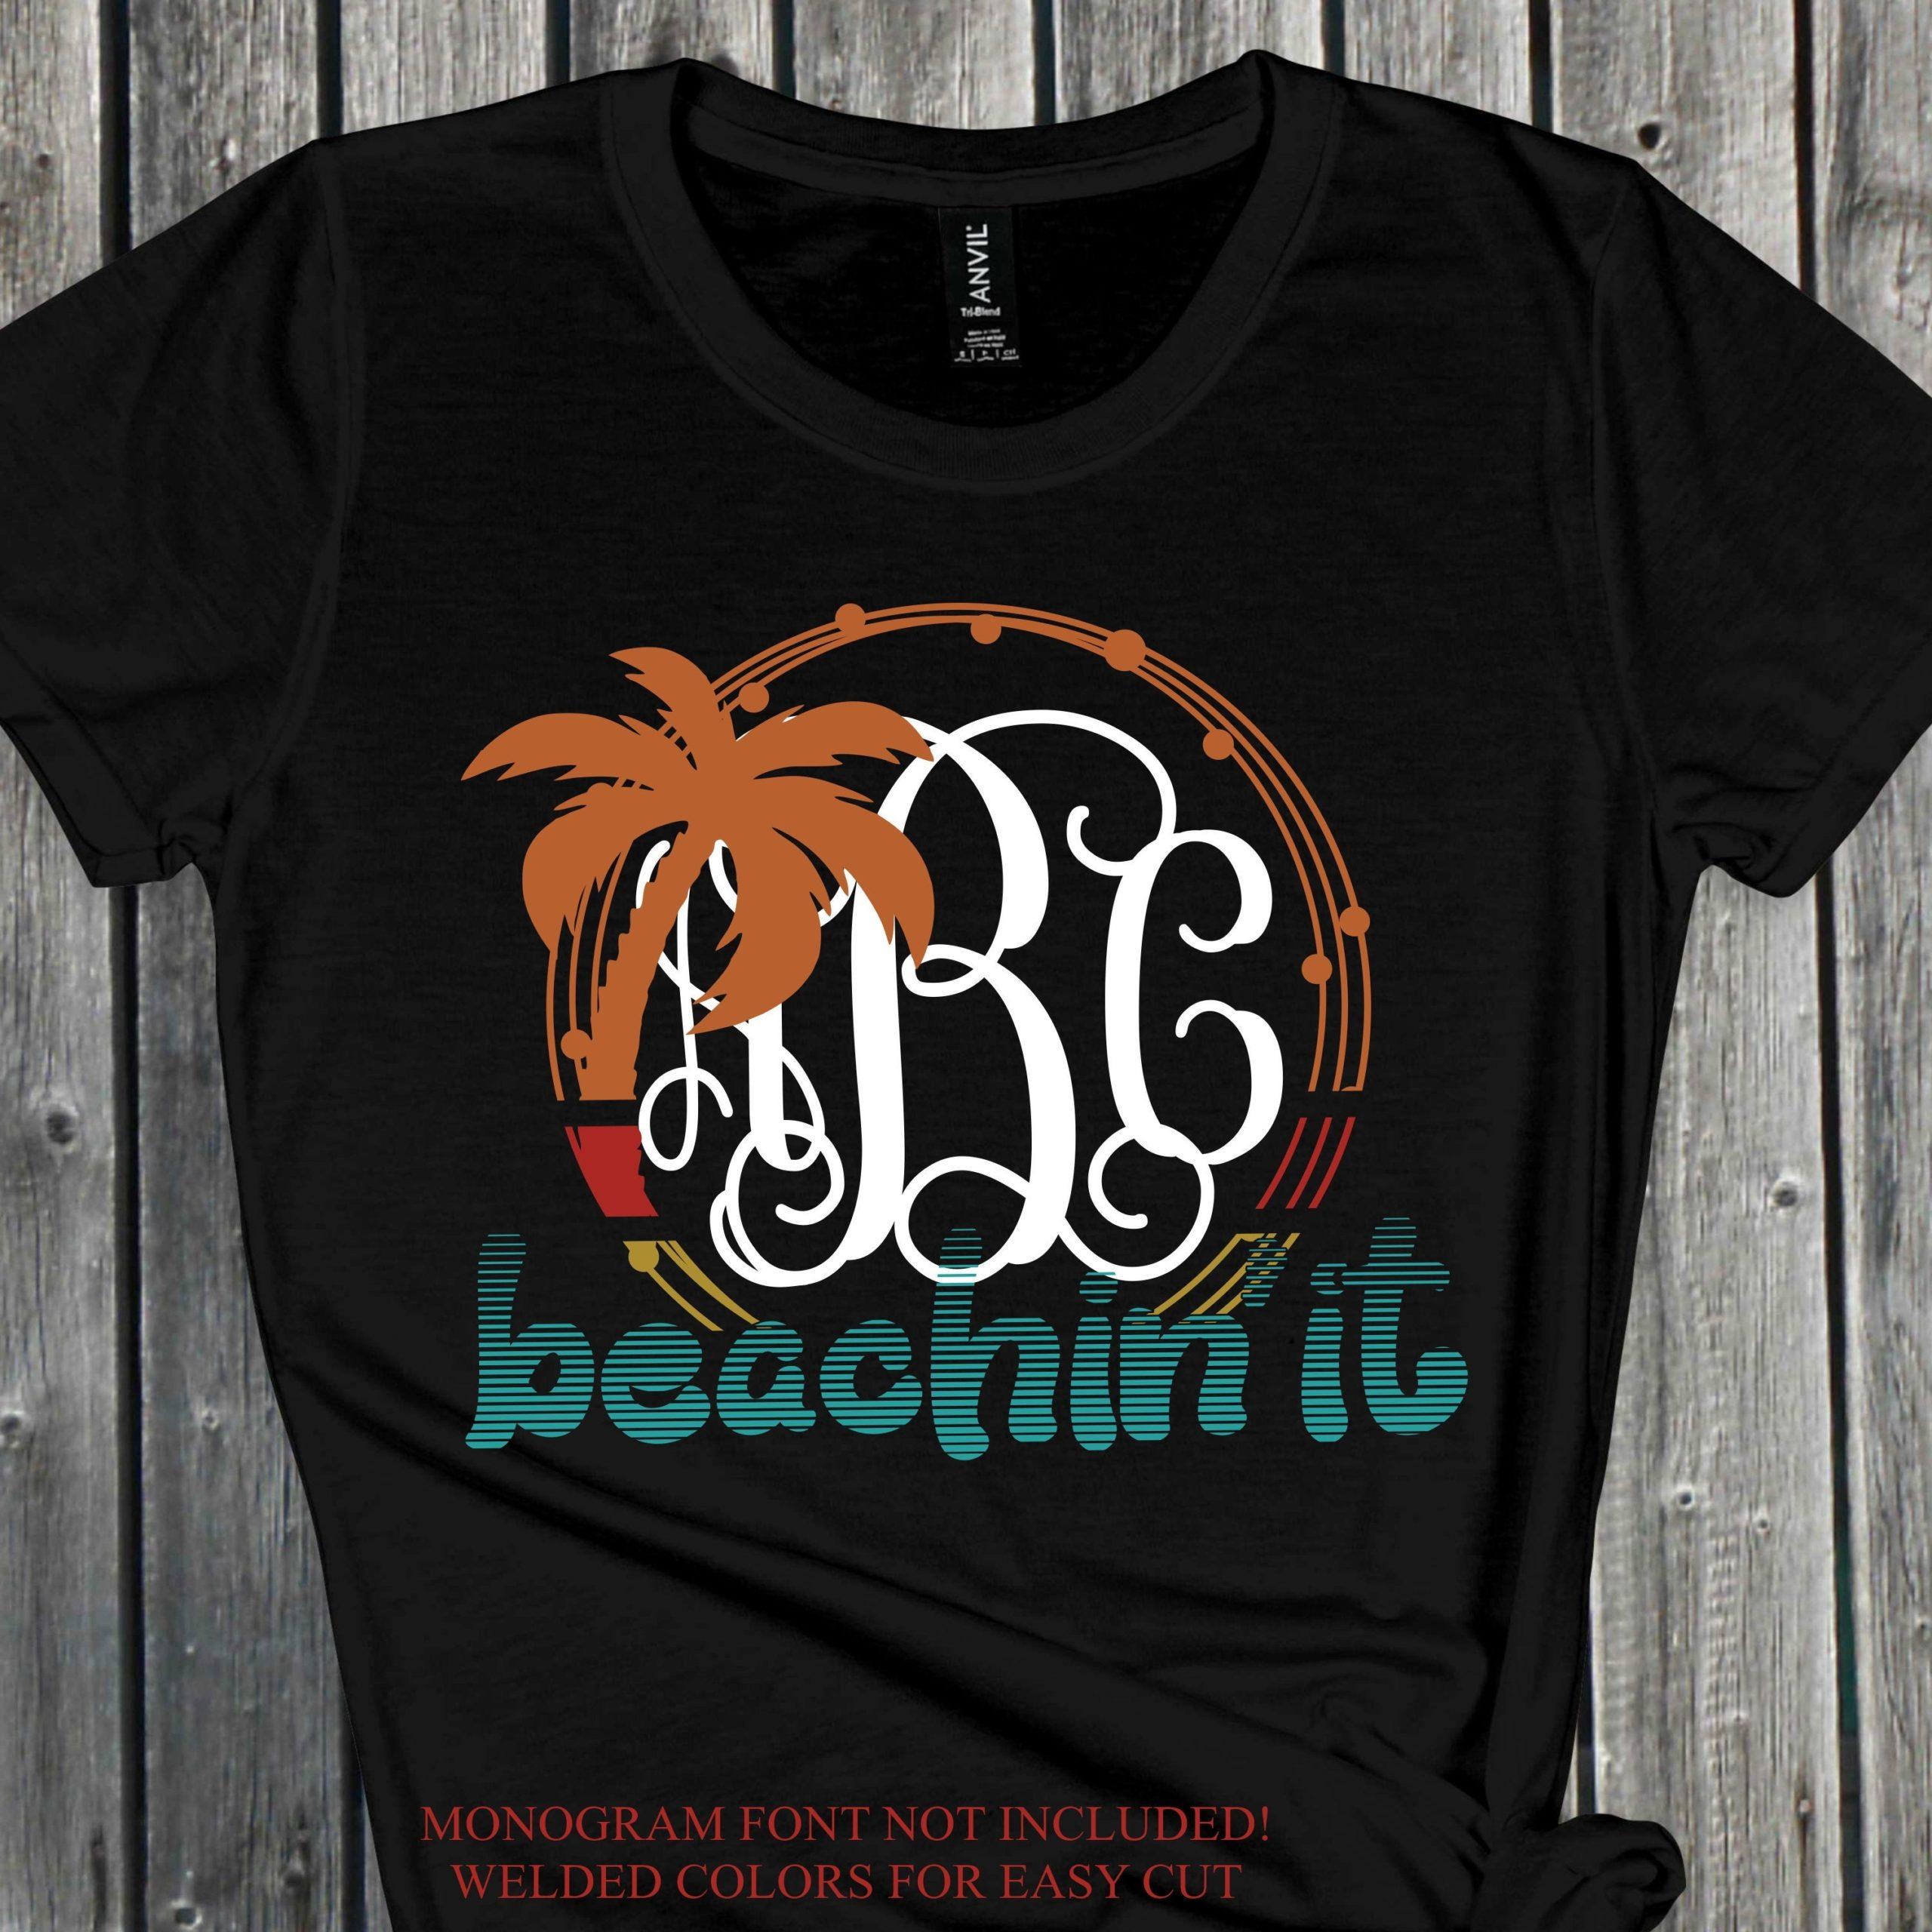 Beachin-it-svg-palm-tree-svg-summer-svgsummer-quotes-svg-hibiscus-svg-tshirt-svgsummertime-svg-svg-for-cricutsilhouette-designs-5ef78ddf